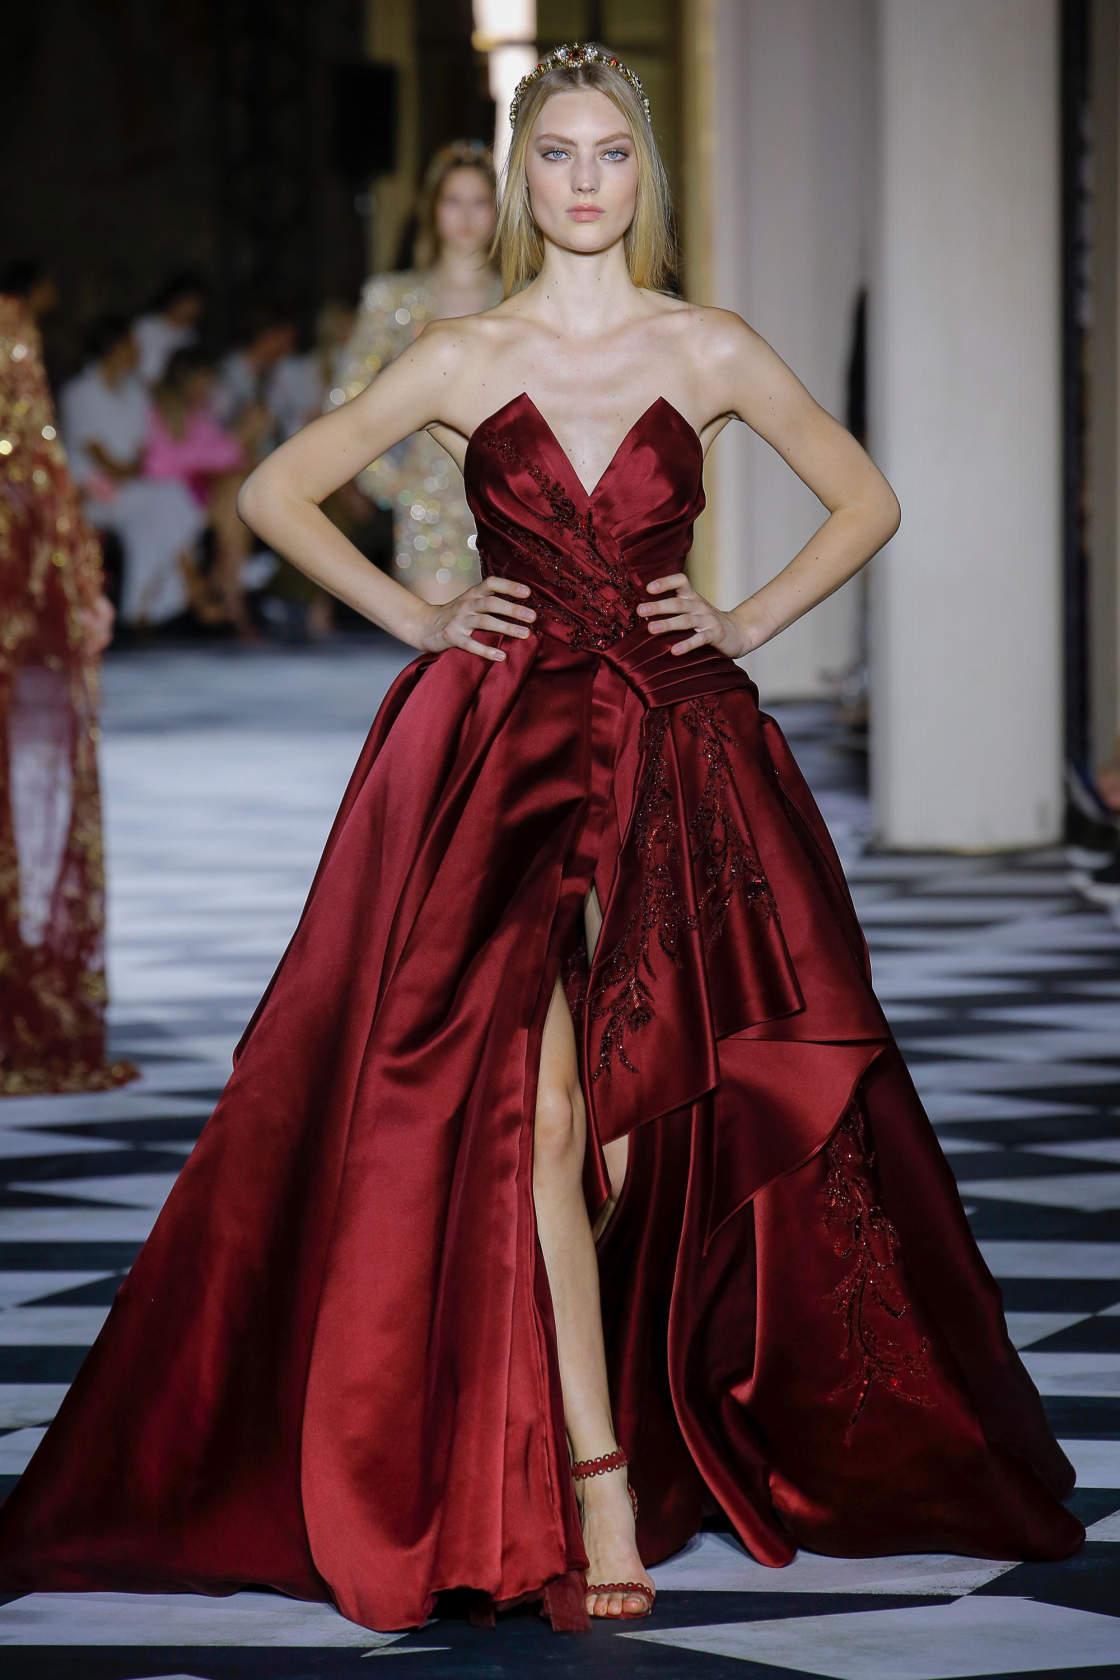 dbb67551816f3b Zuhair Murad, Осень-зима 2018/2019 / Couture / НЕДЕЛЯ МОДЫ: Париж